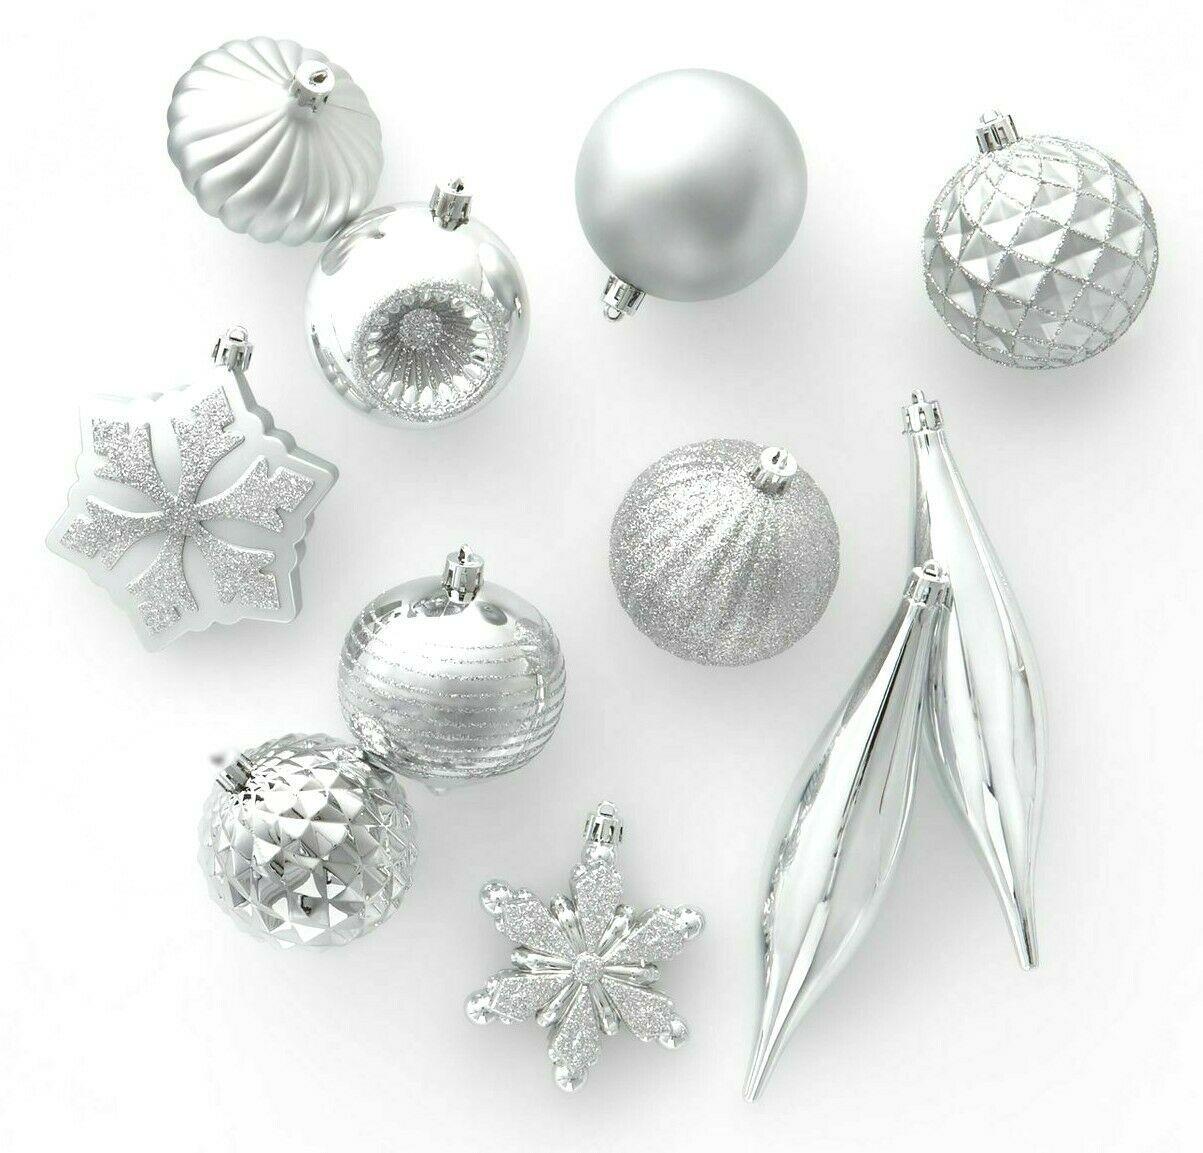 40ct Silver Shatter Proof Resistant Christmas Tree Ornament Set Wondershop NEW